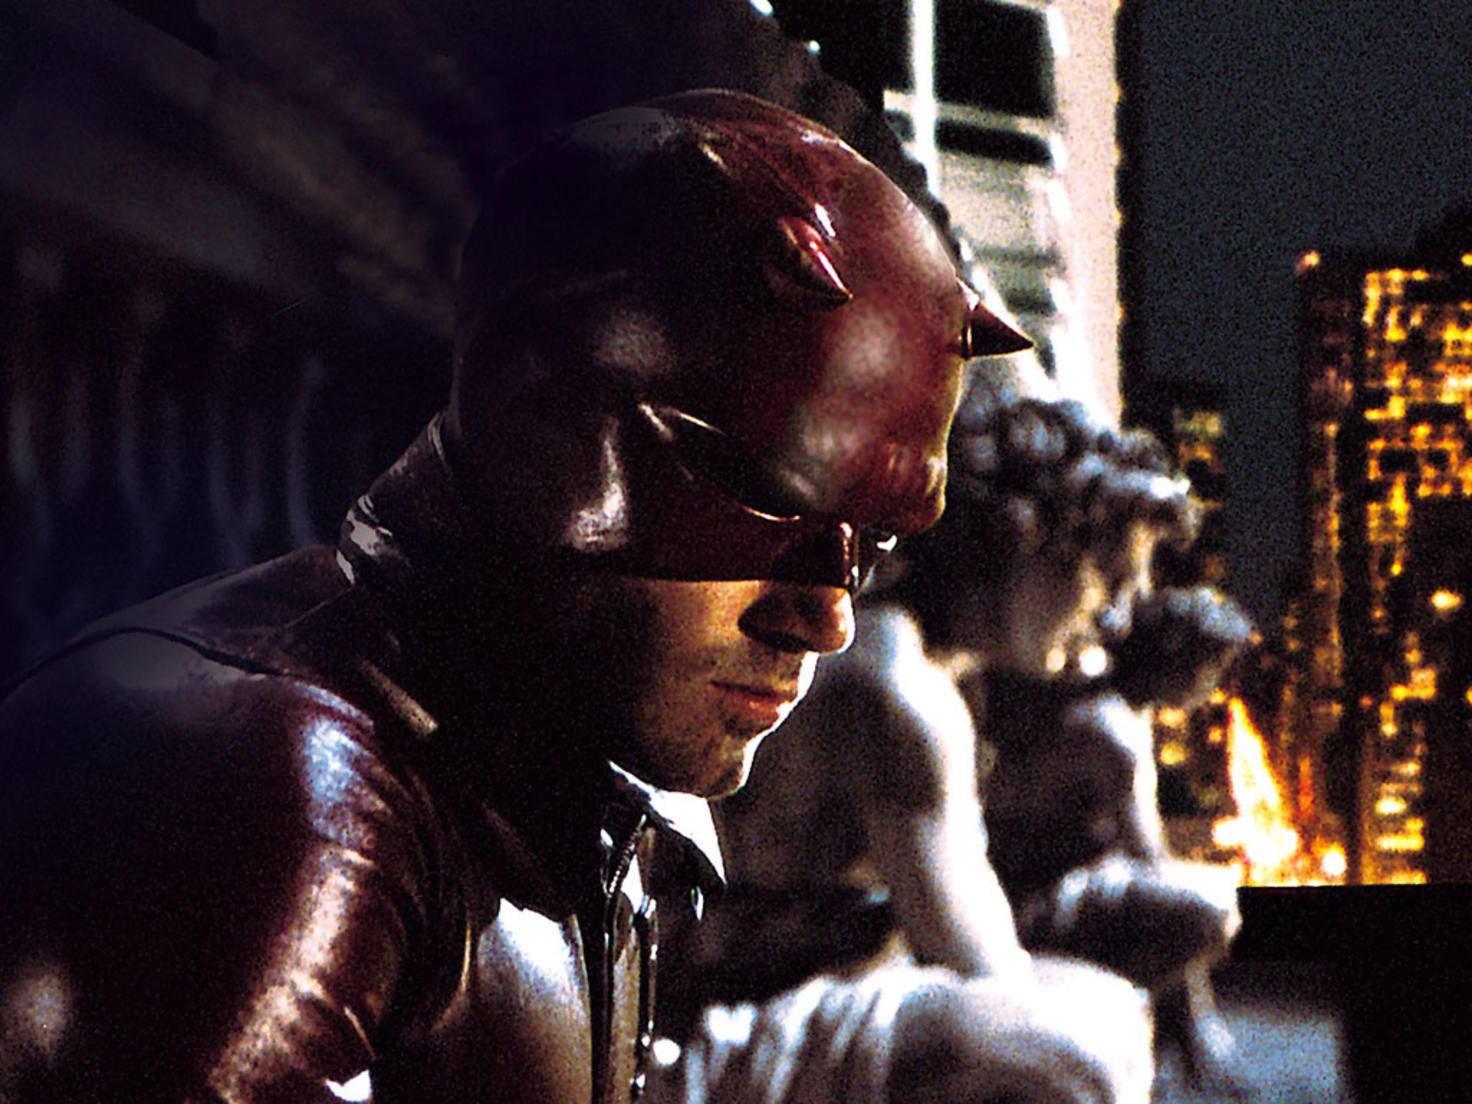 Superhelden: Daredevil